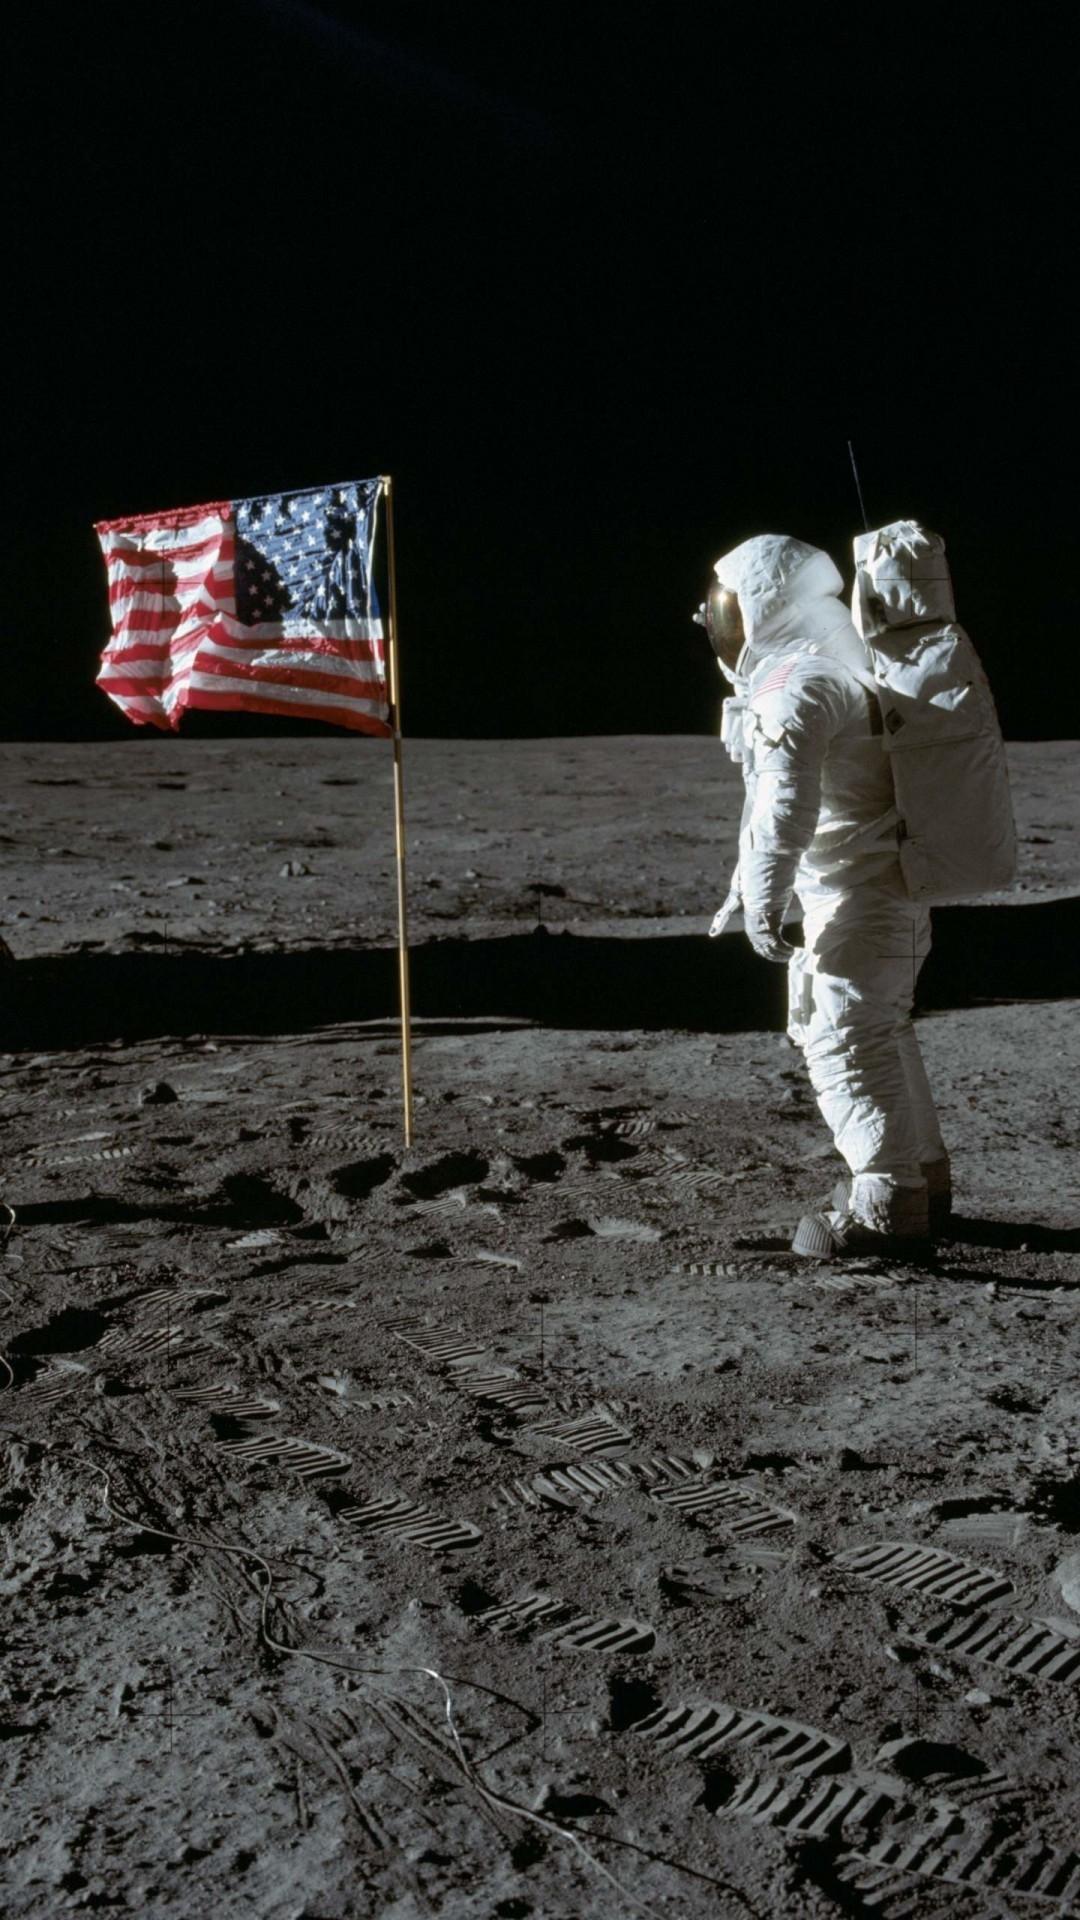 Buzz Aldrin in the moon